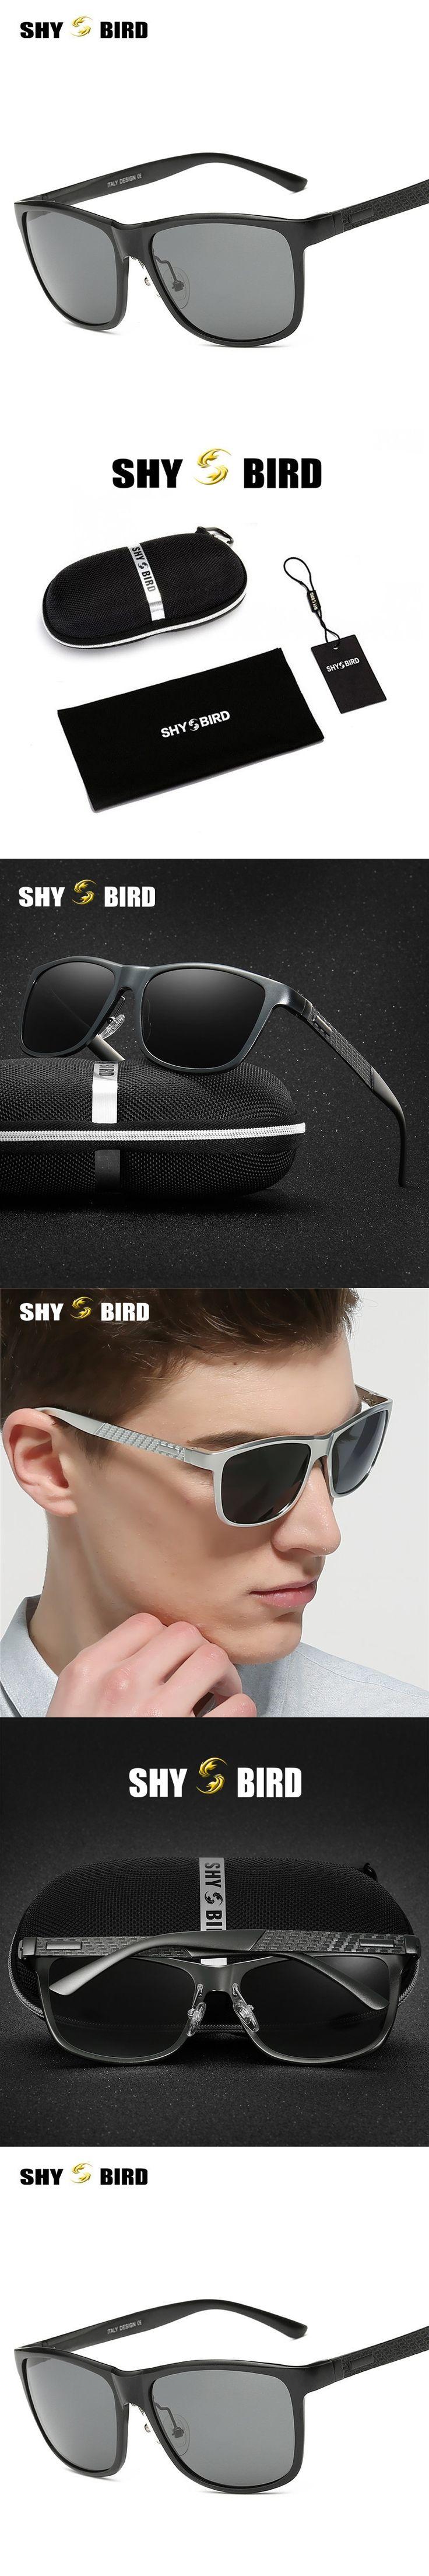 Men's Aluminum And Polarized Magnified Sunglasses Mirrored Designer Sunglasses Men's Driving Sunglasses Sunglasses 8587